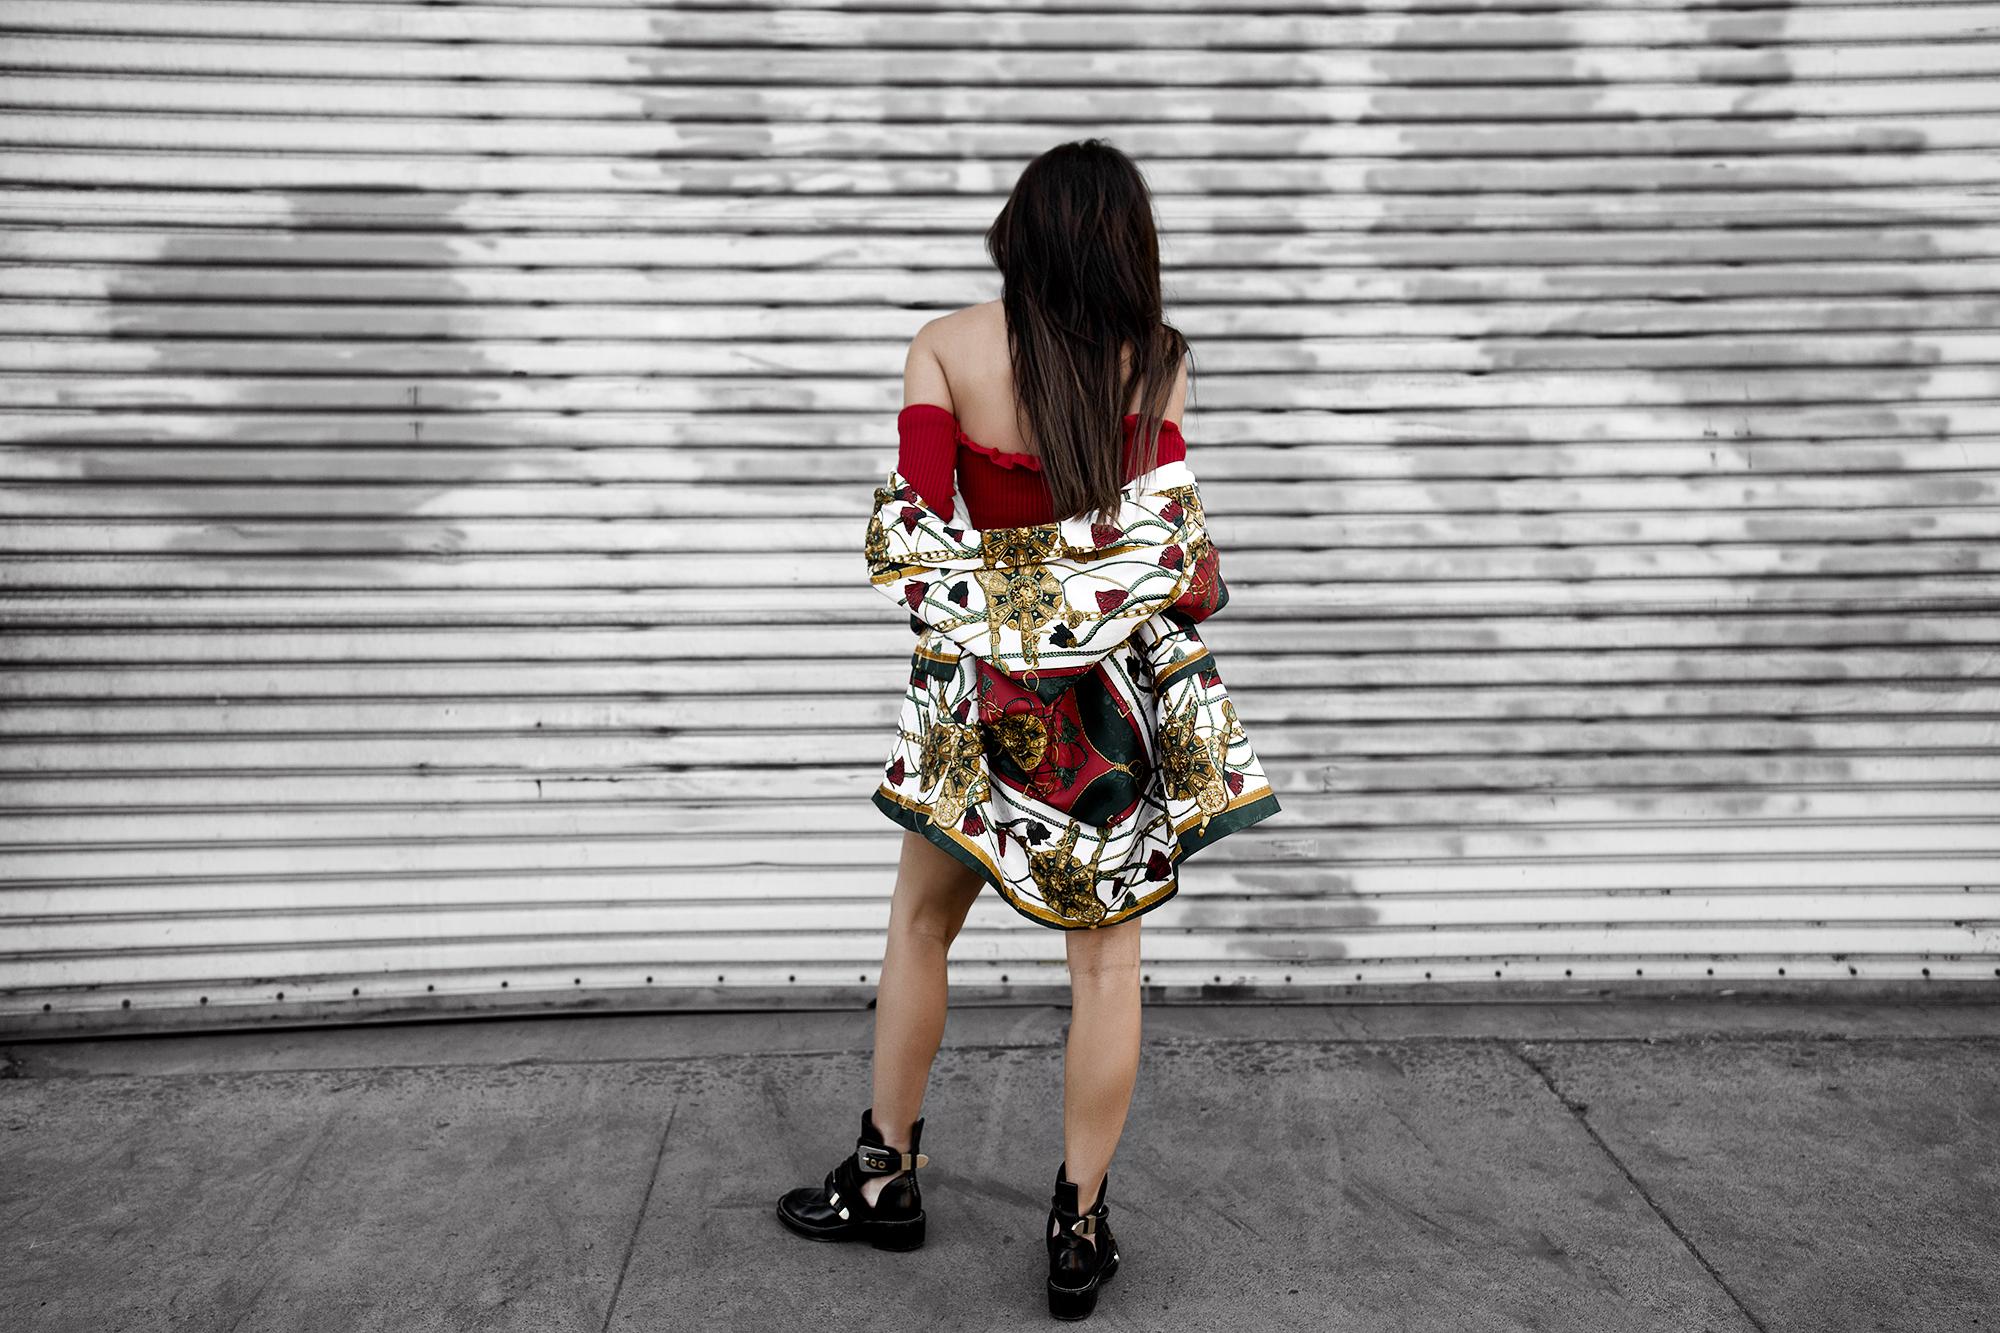 erica stolman talks shopping vintage clothes online